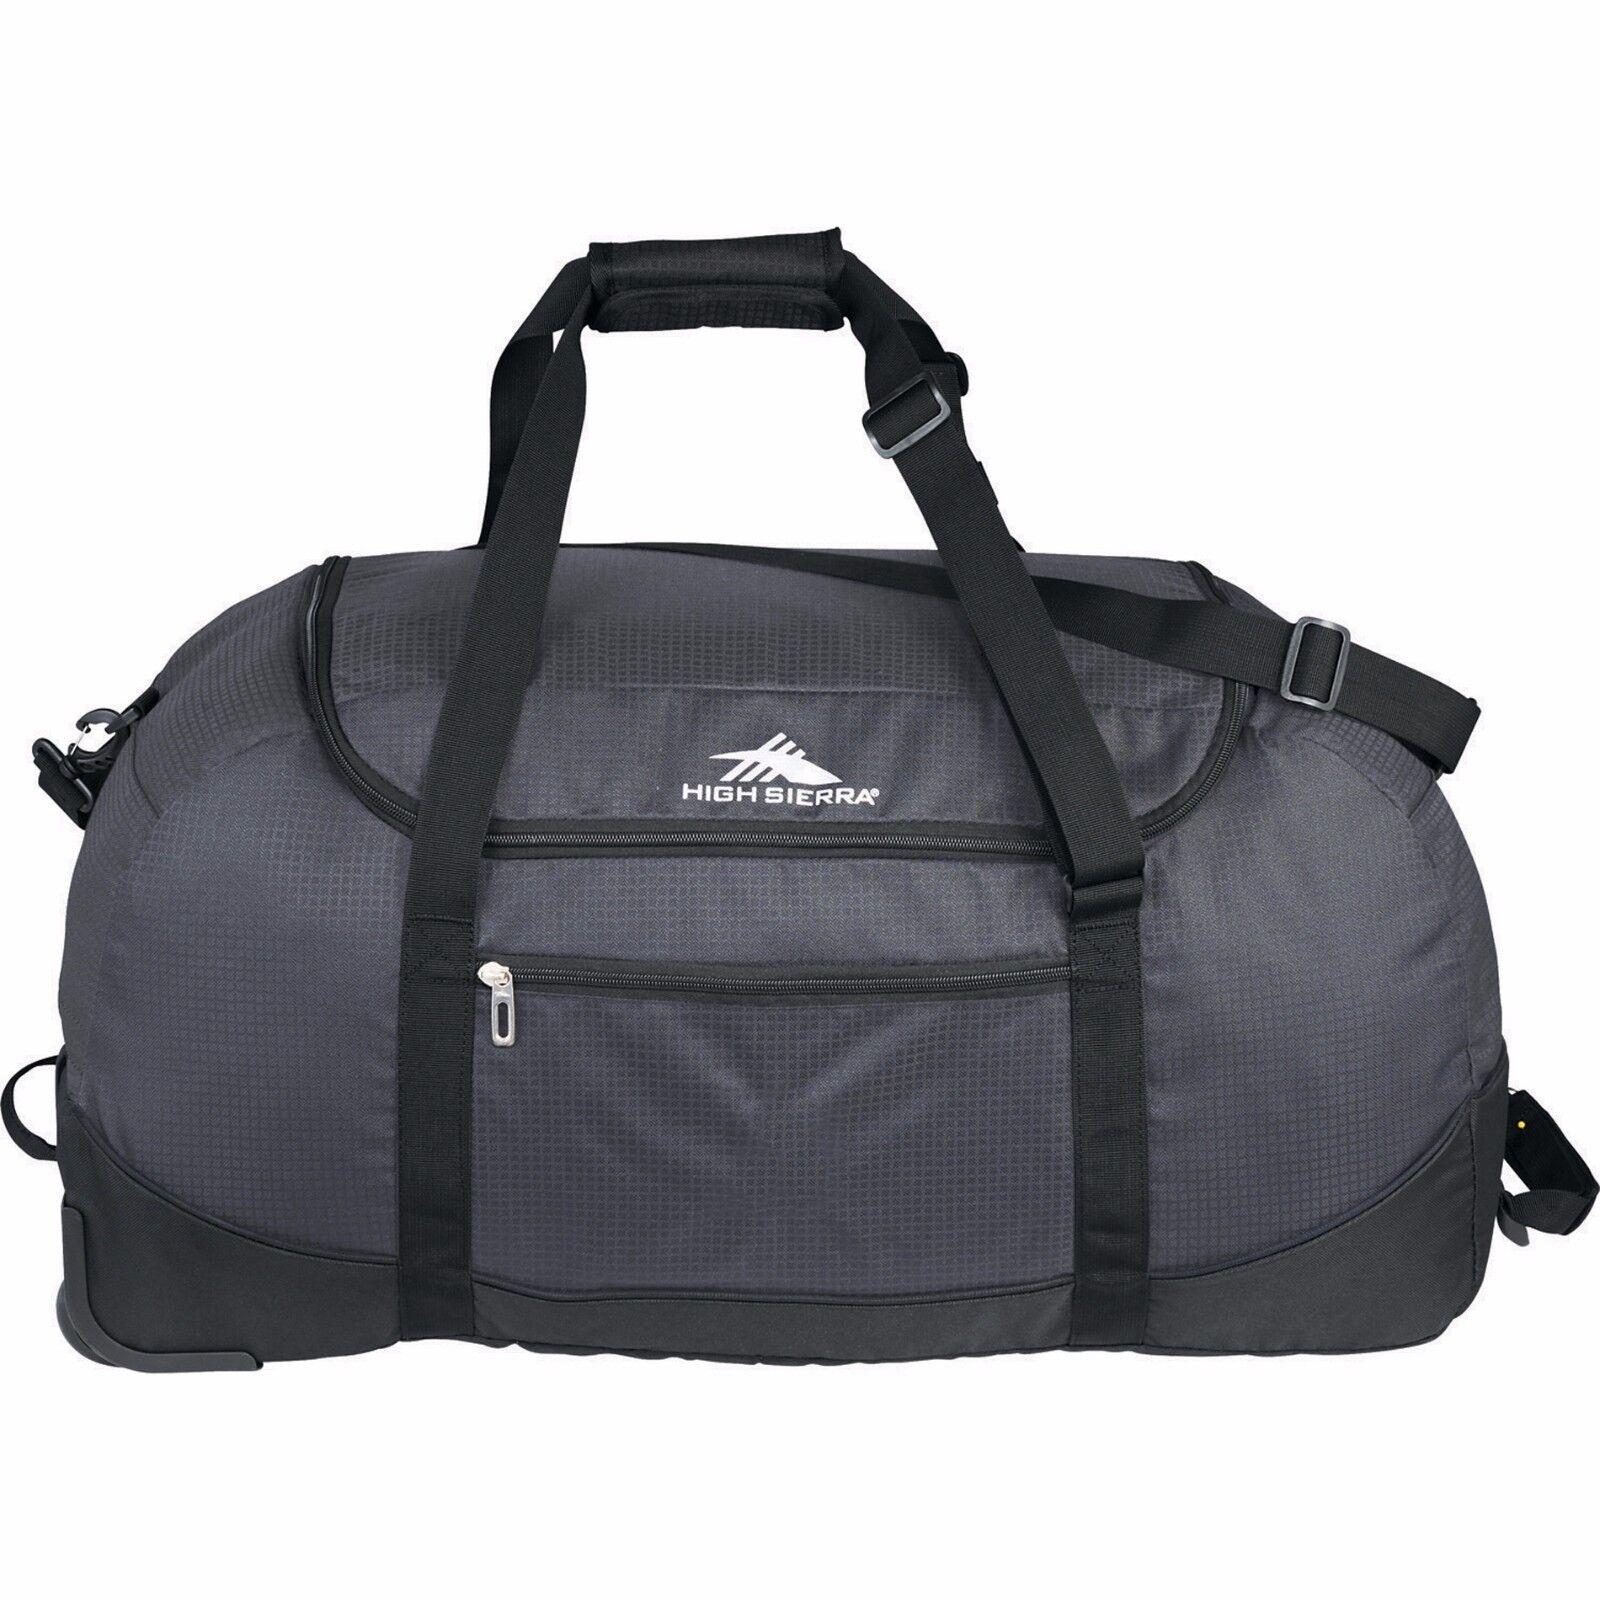 "High Sierra® Pack 30"" Wheel-N-Go Duffel Bag TRAVEL sports w"